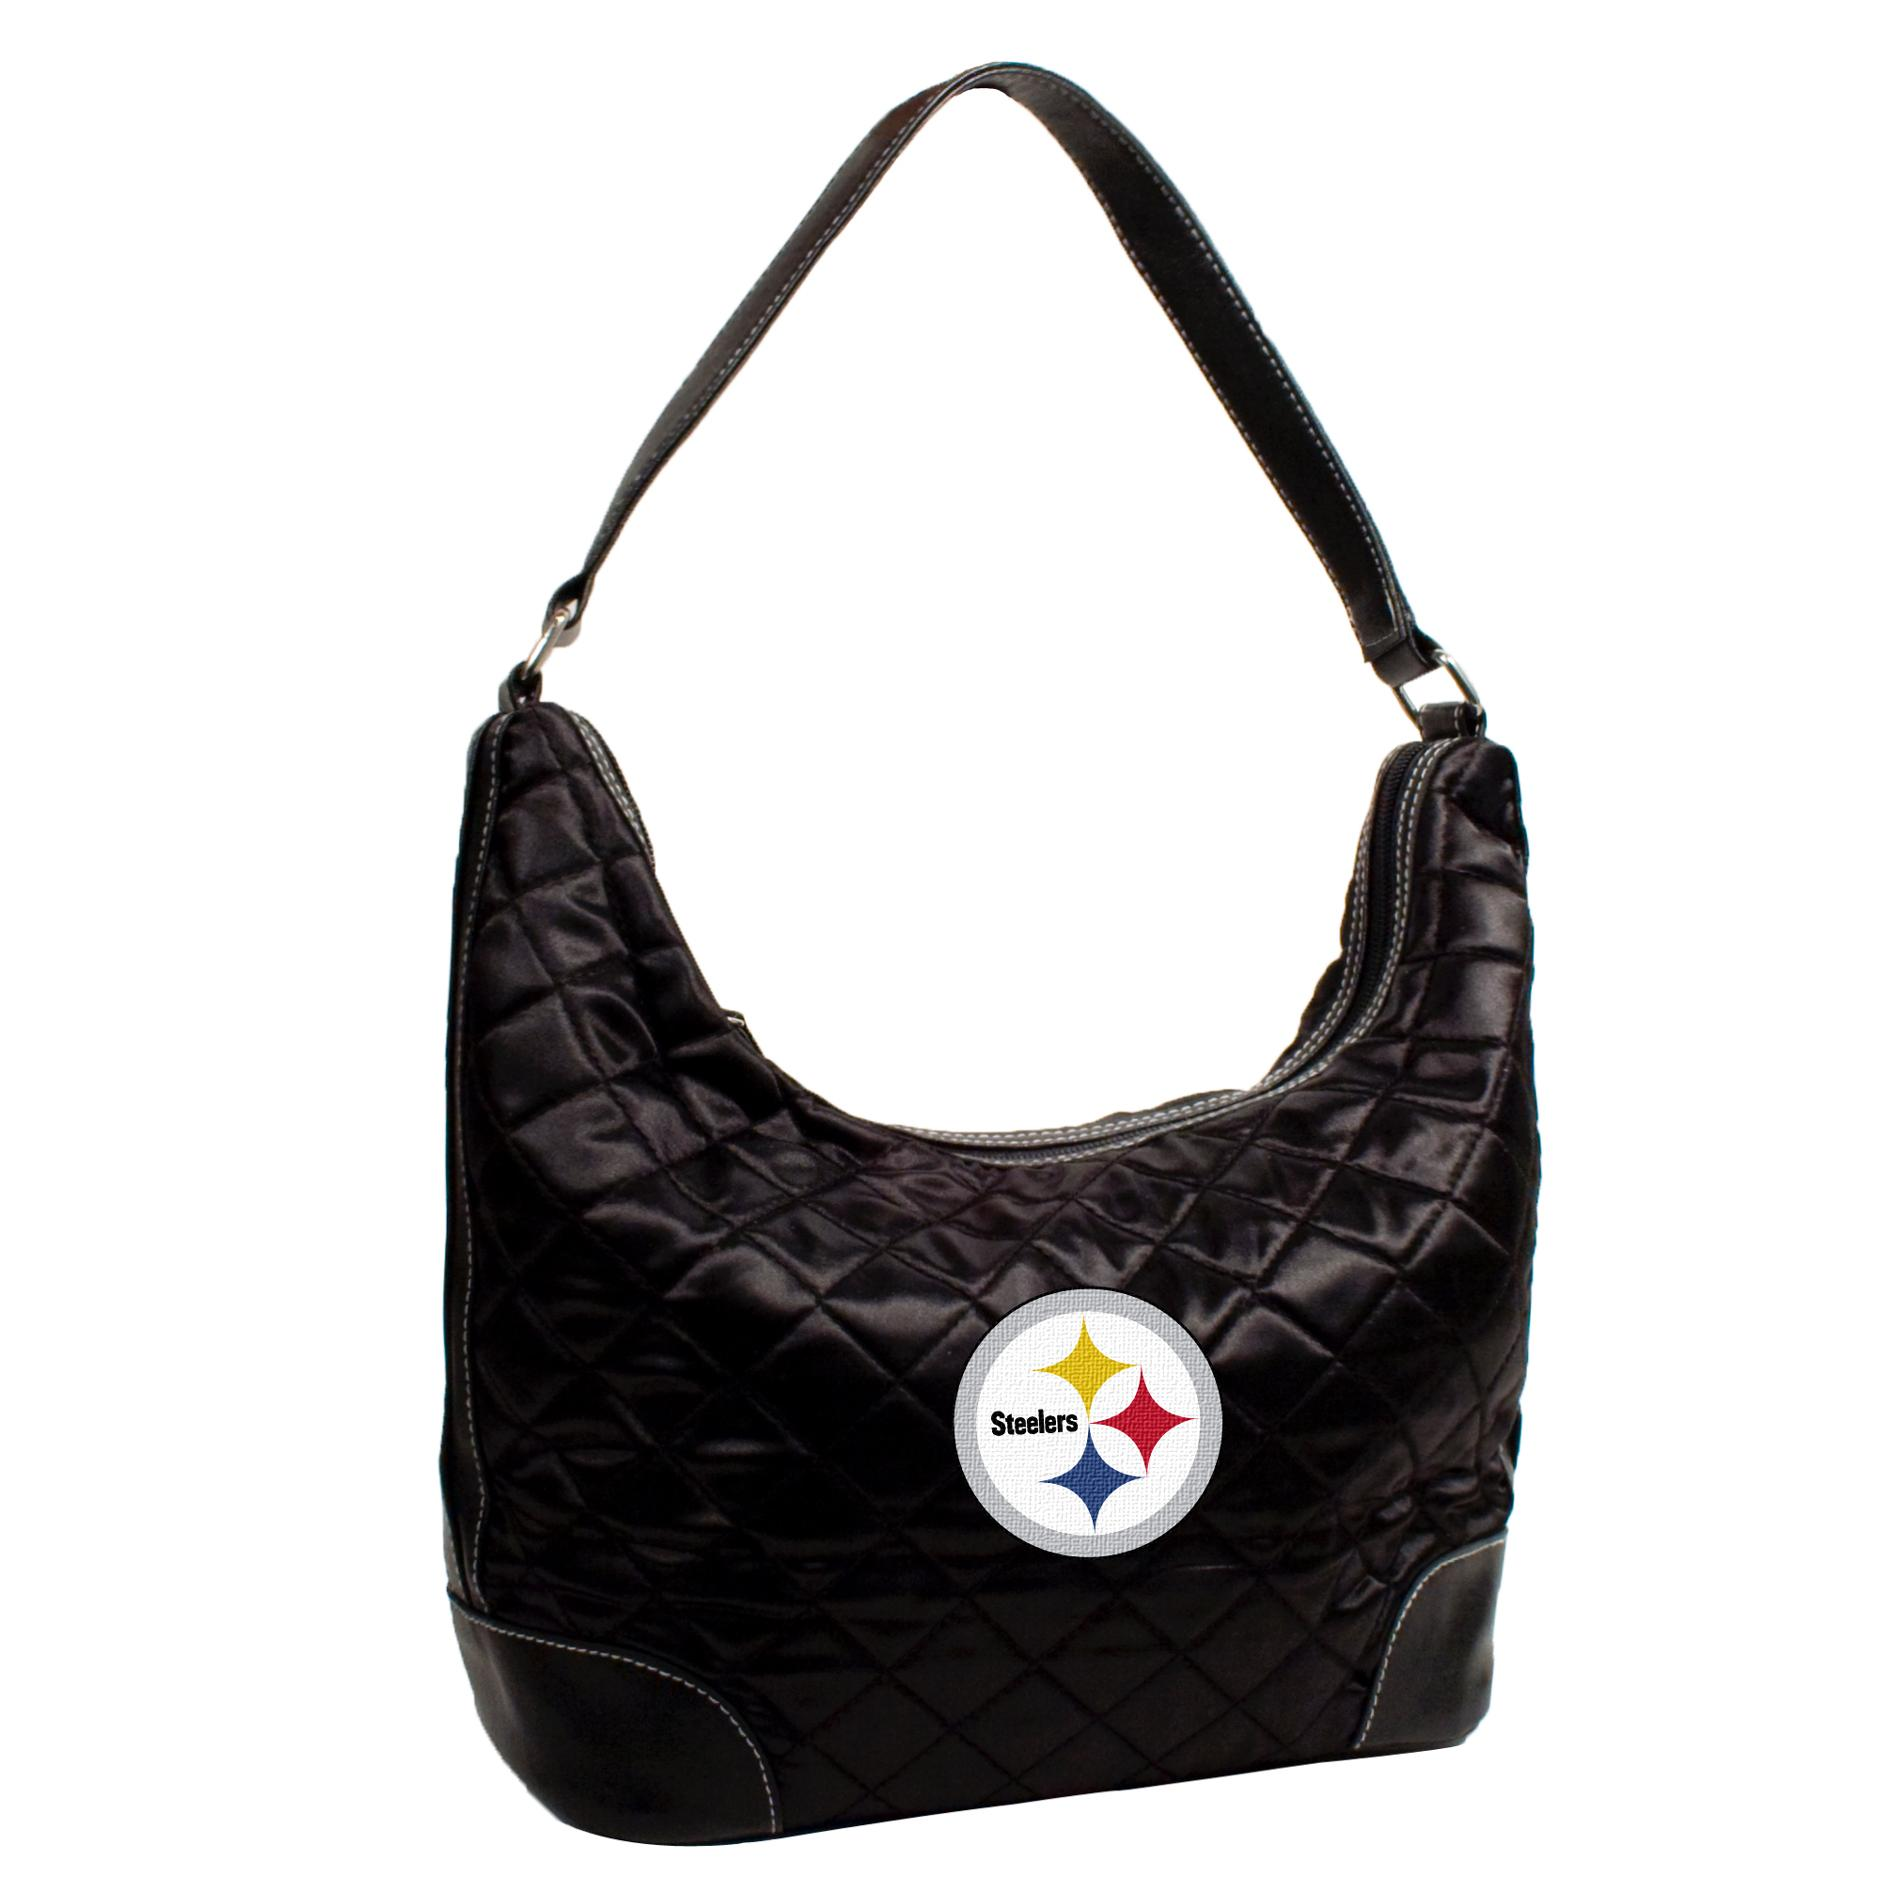 Pittsburgh Steelers Quilted Hobo Handbag